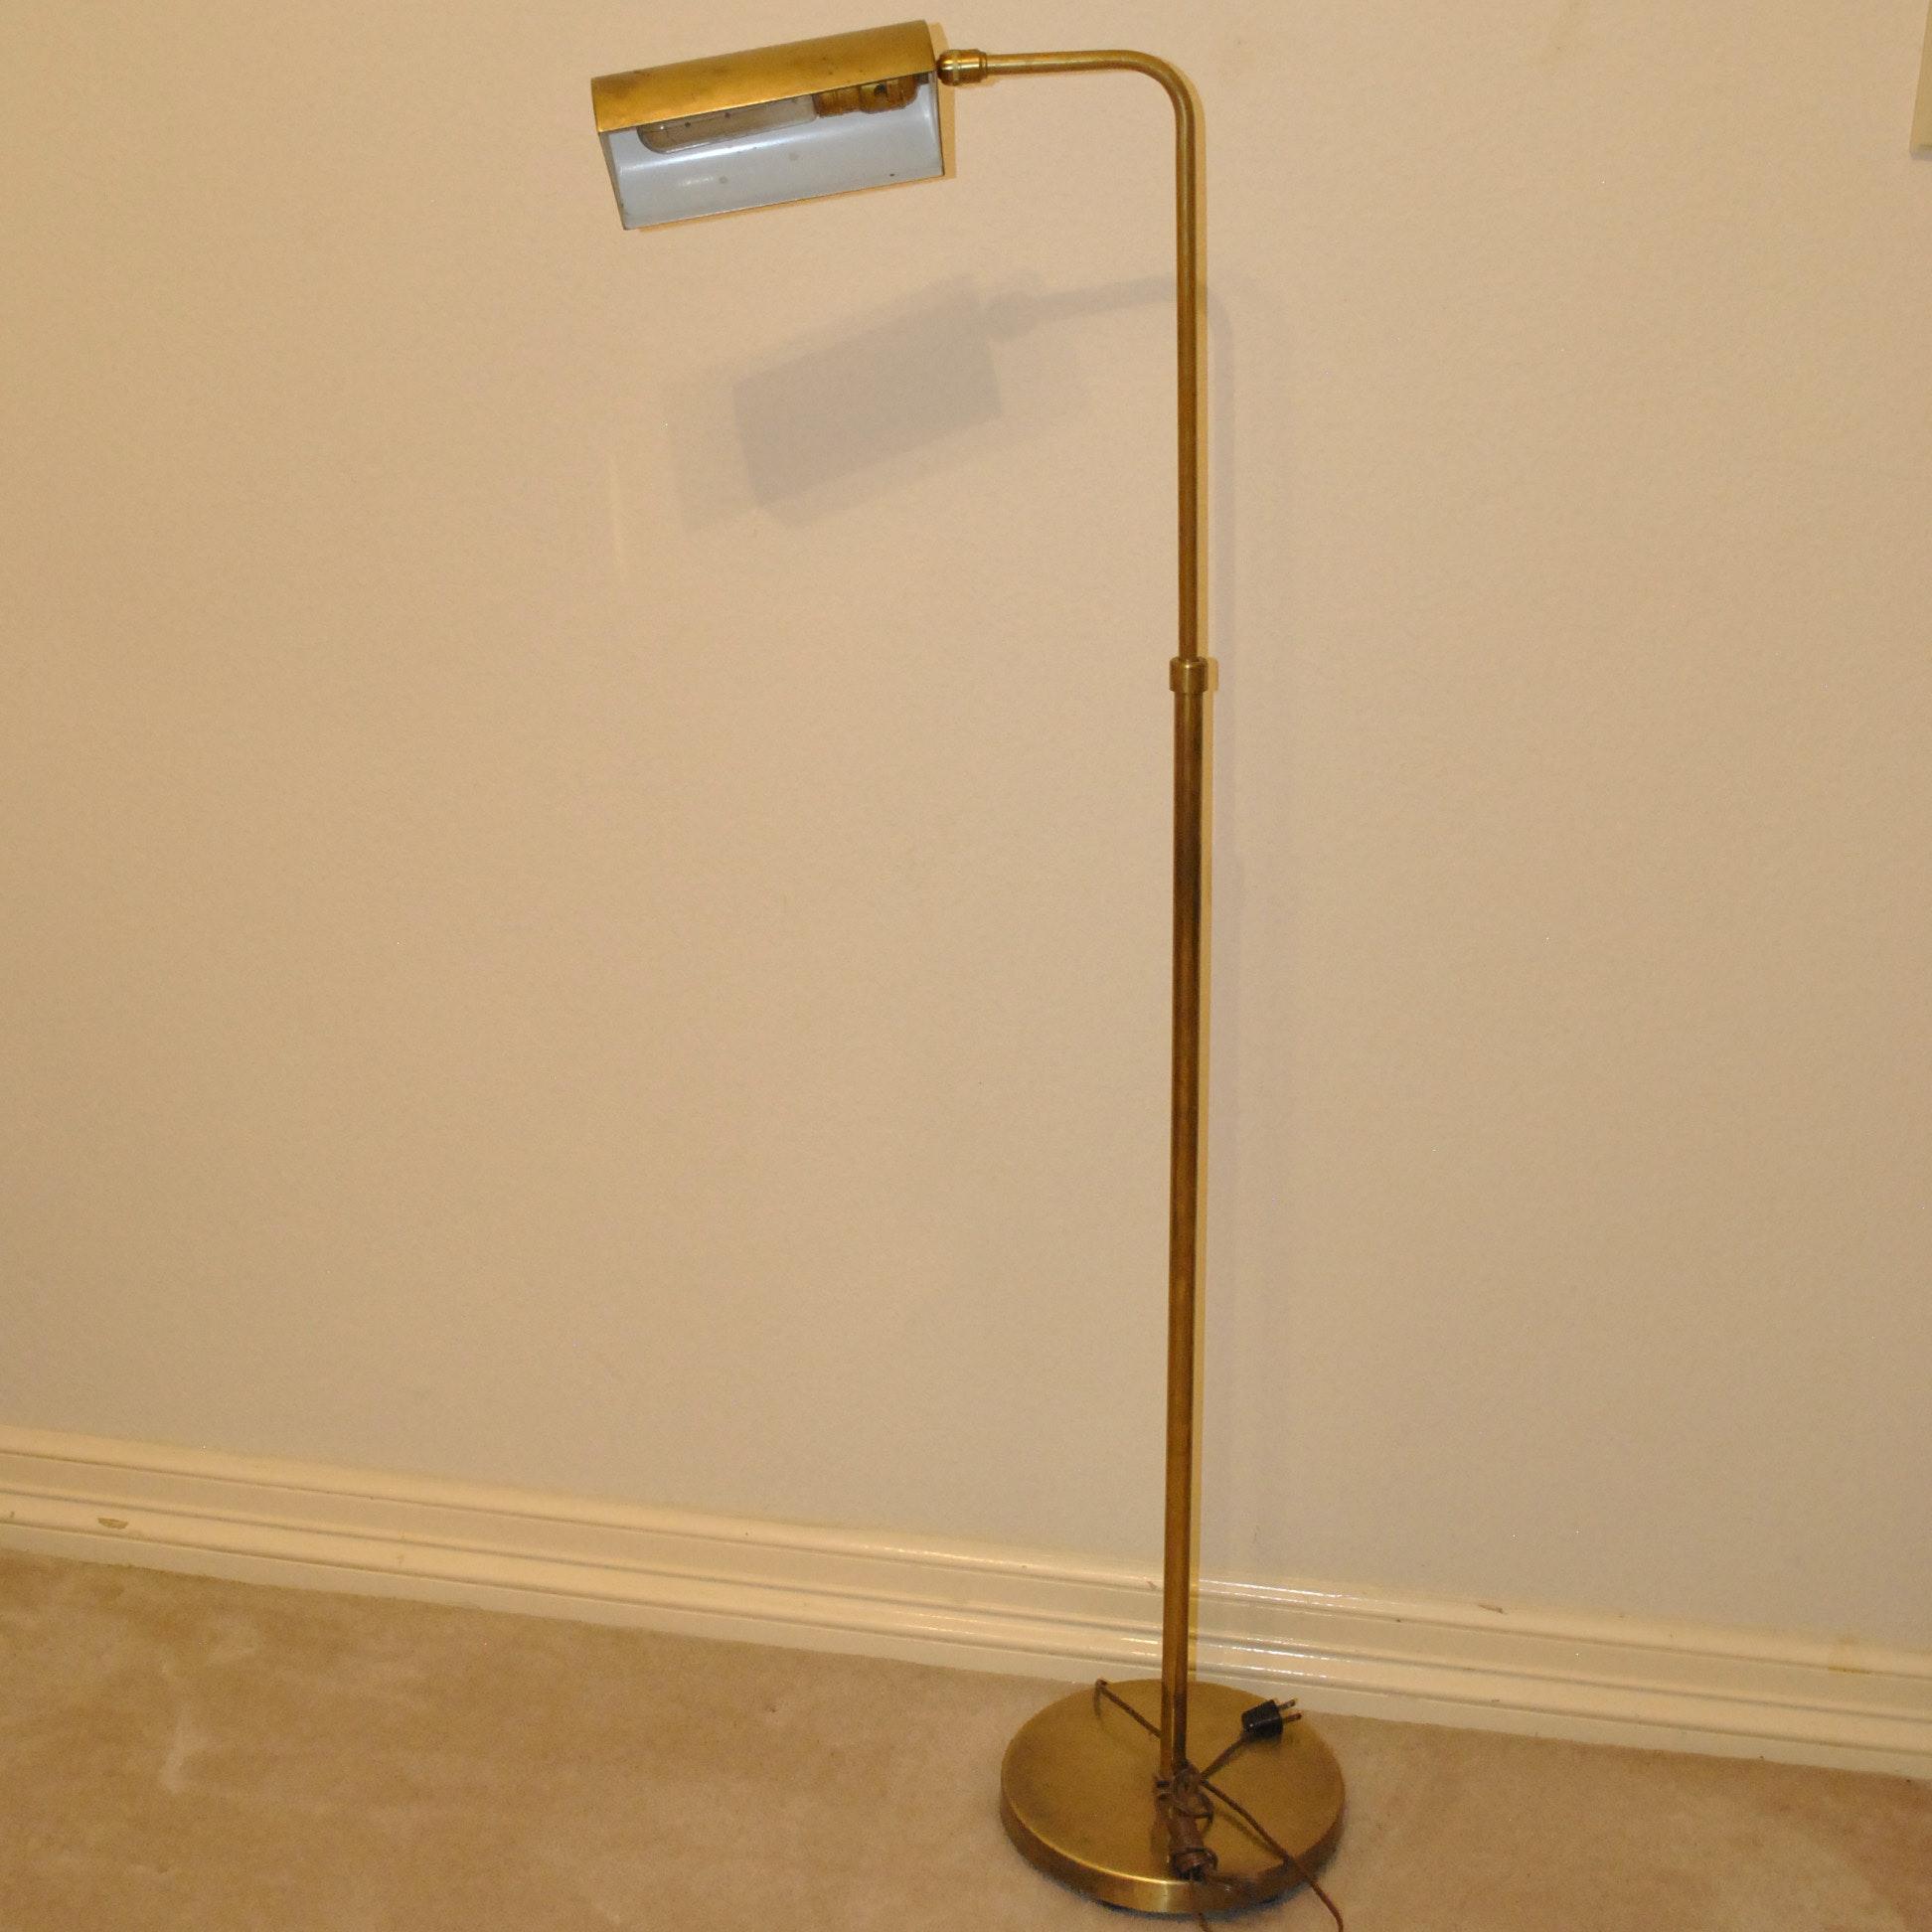 Vintage Brass Tone Metal Floor Lamp with Adjustable Hood